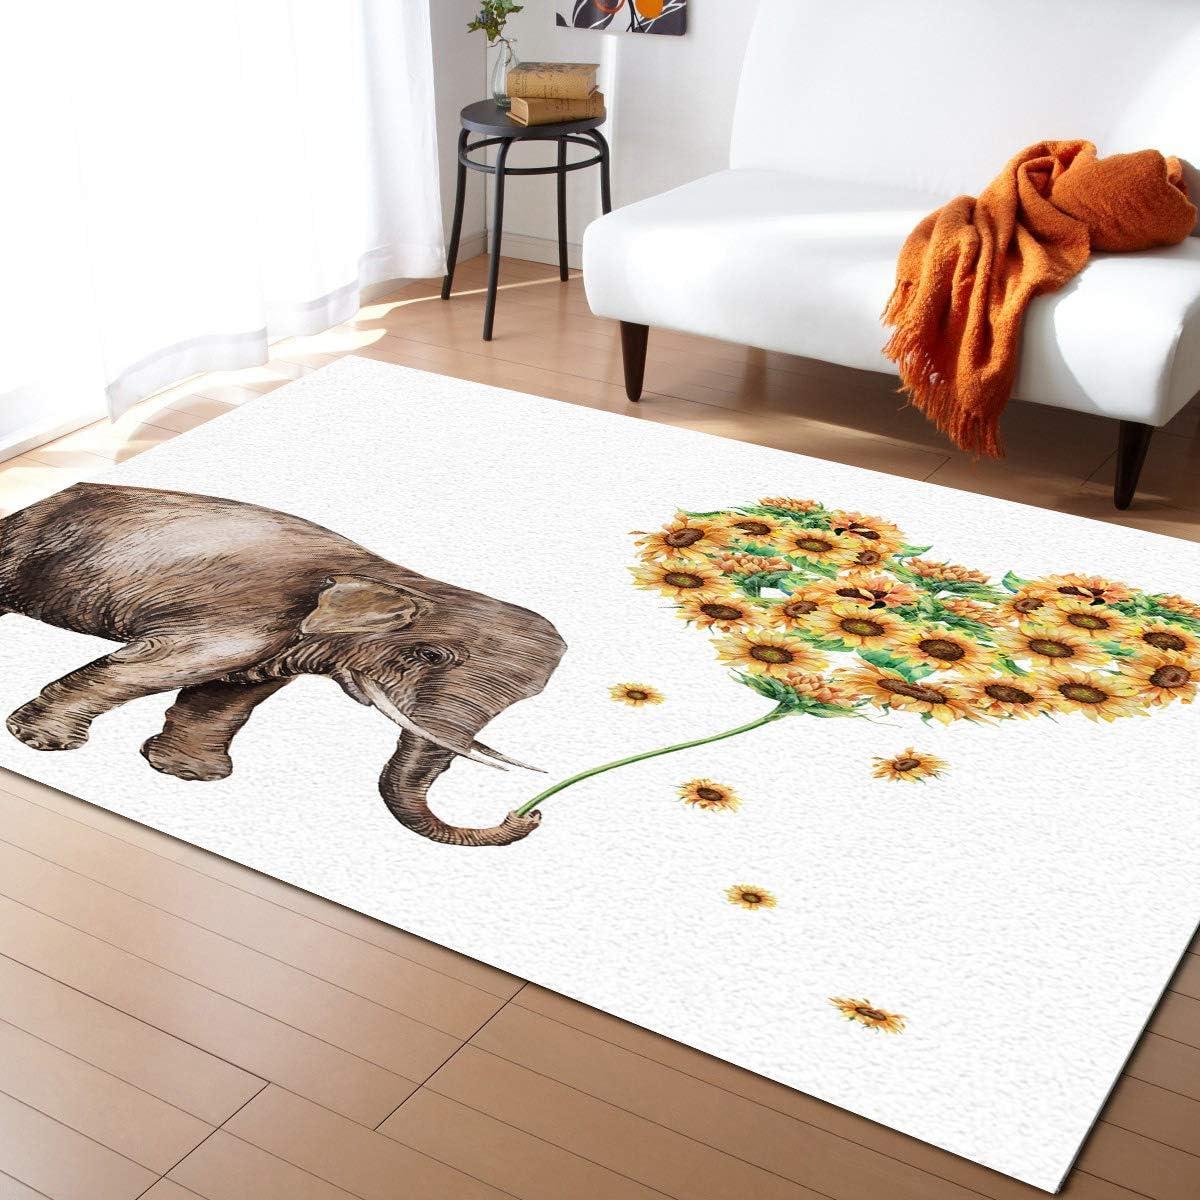 ARTSHOWING Elephant Rectangular Area Rug 2' x Tucson Mall Indoor Large a 3' Ranking TOP6